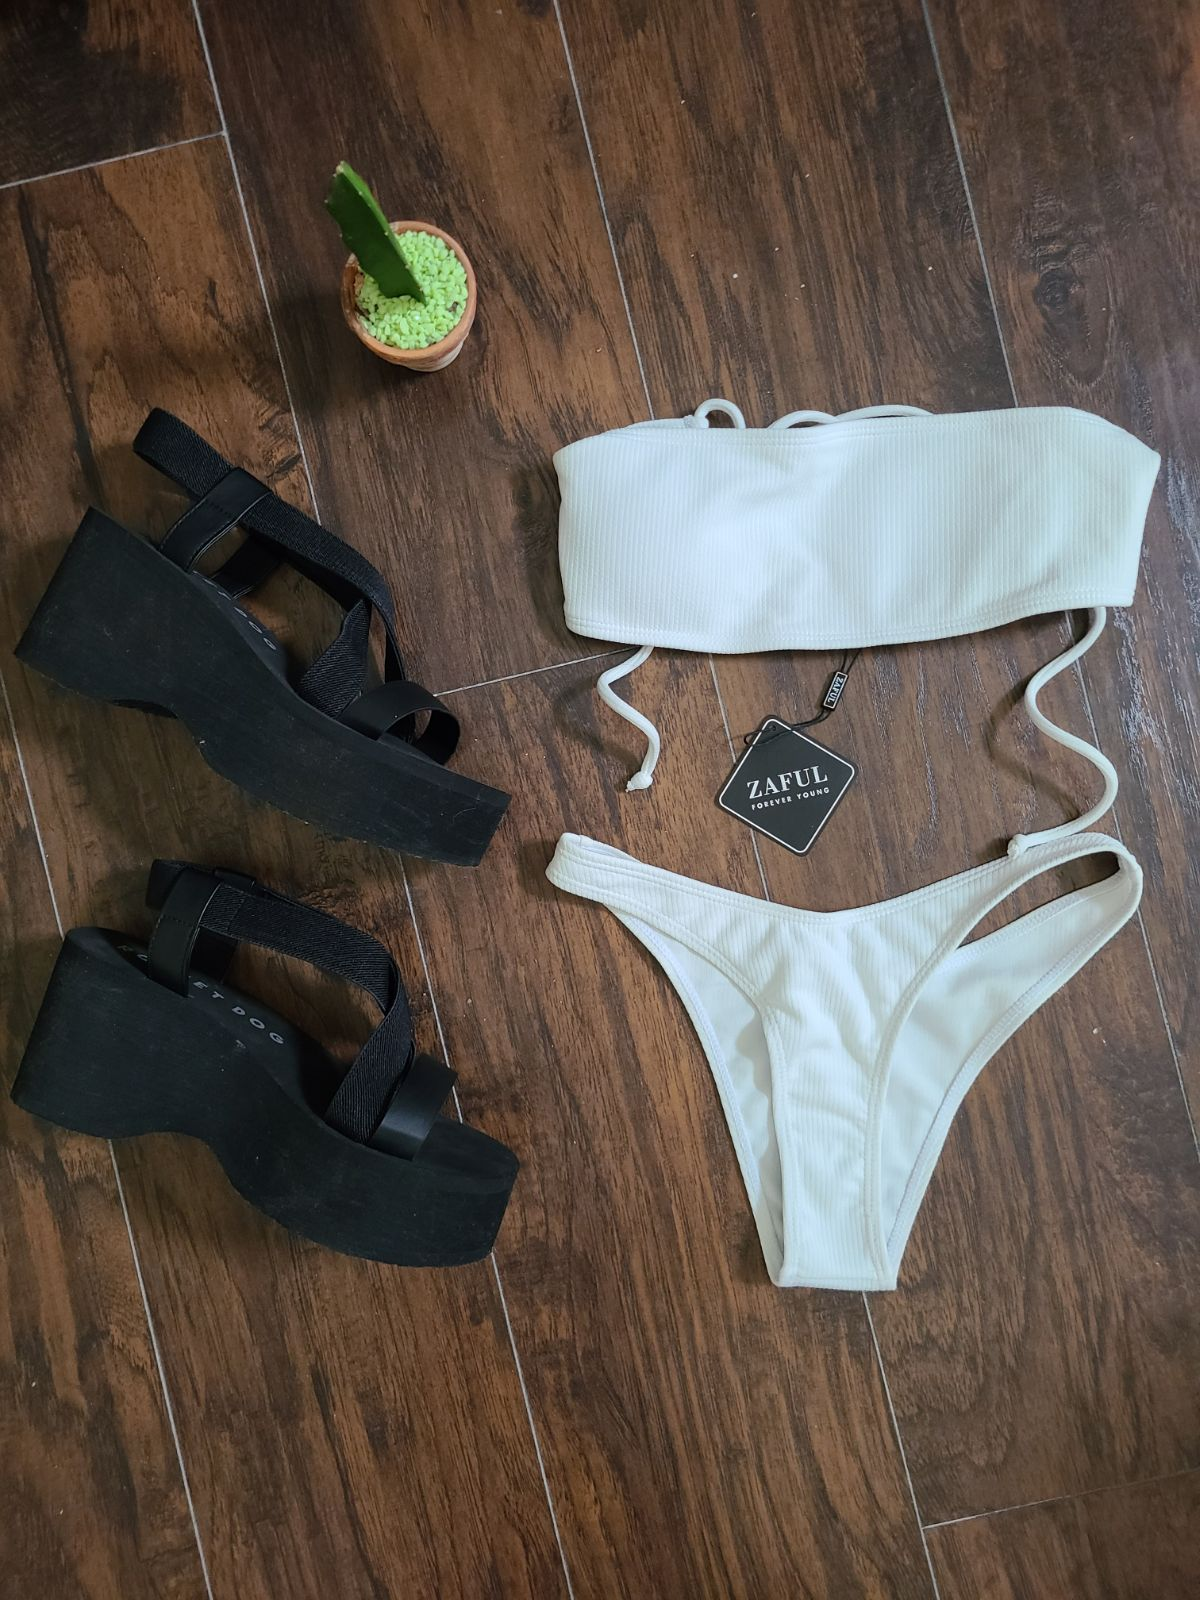 Zaful White Thong bikini size S